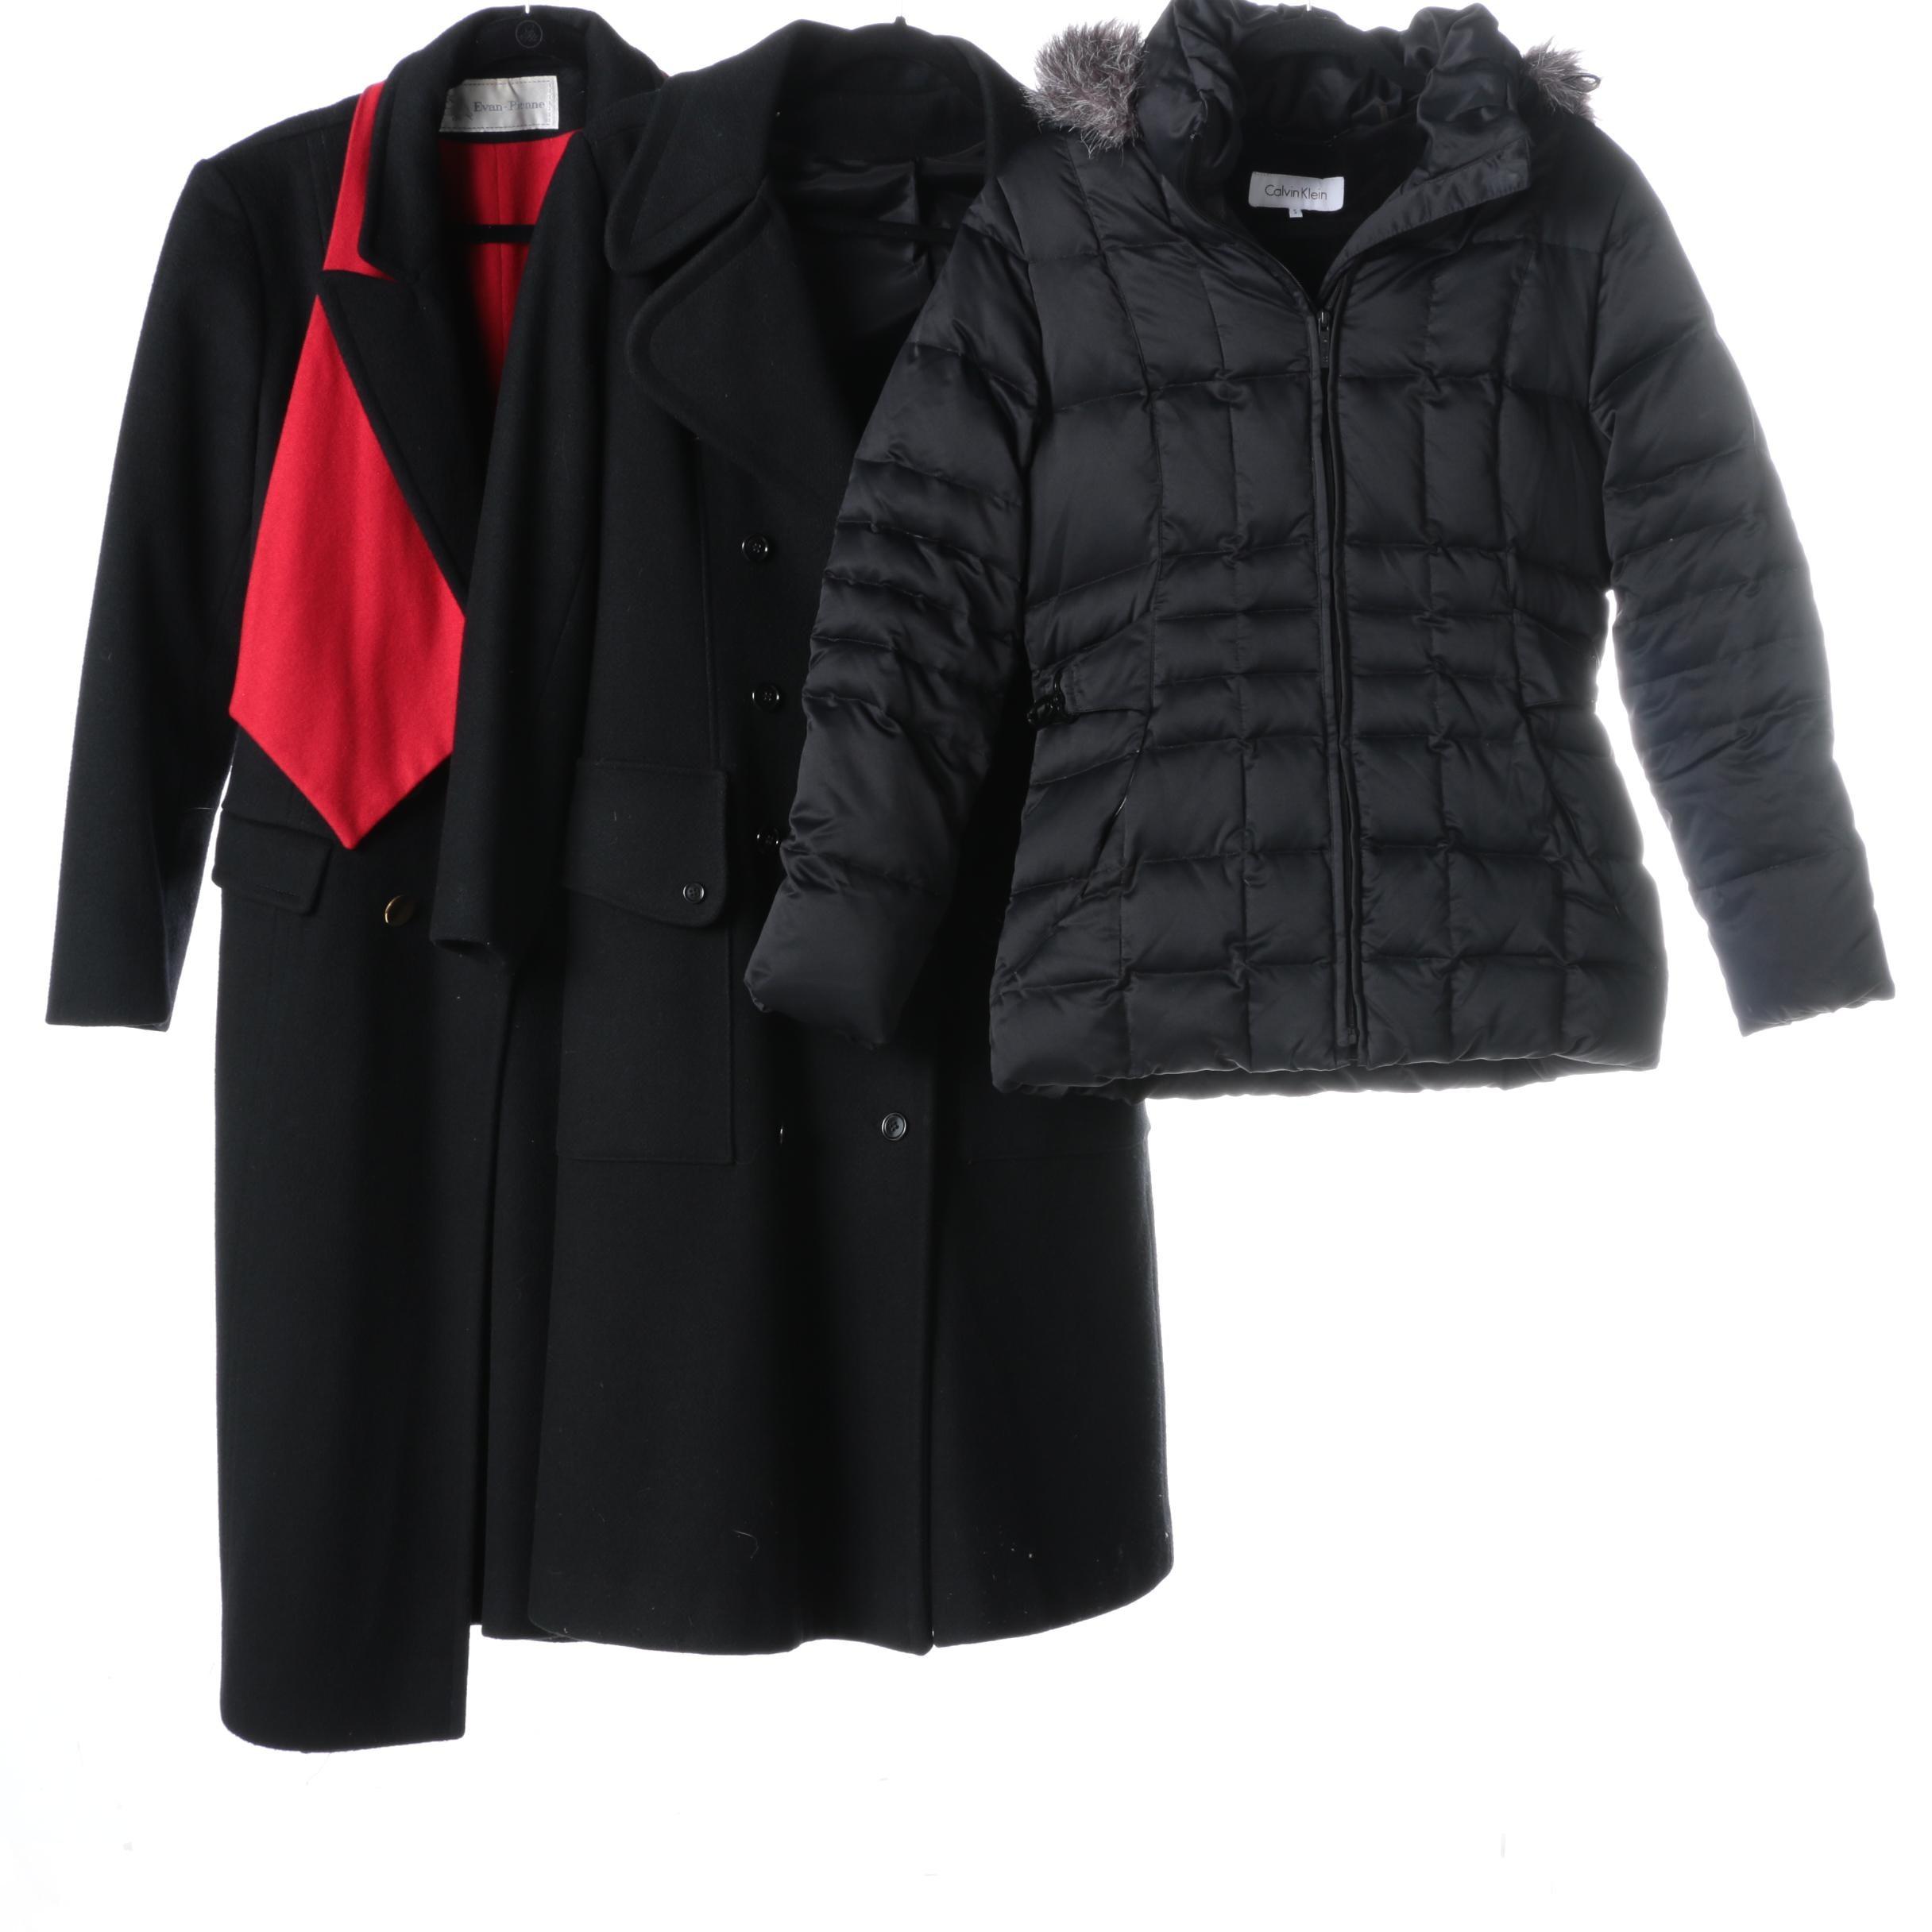 Women's Black Coats Including Calvin Klein